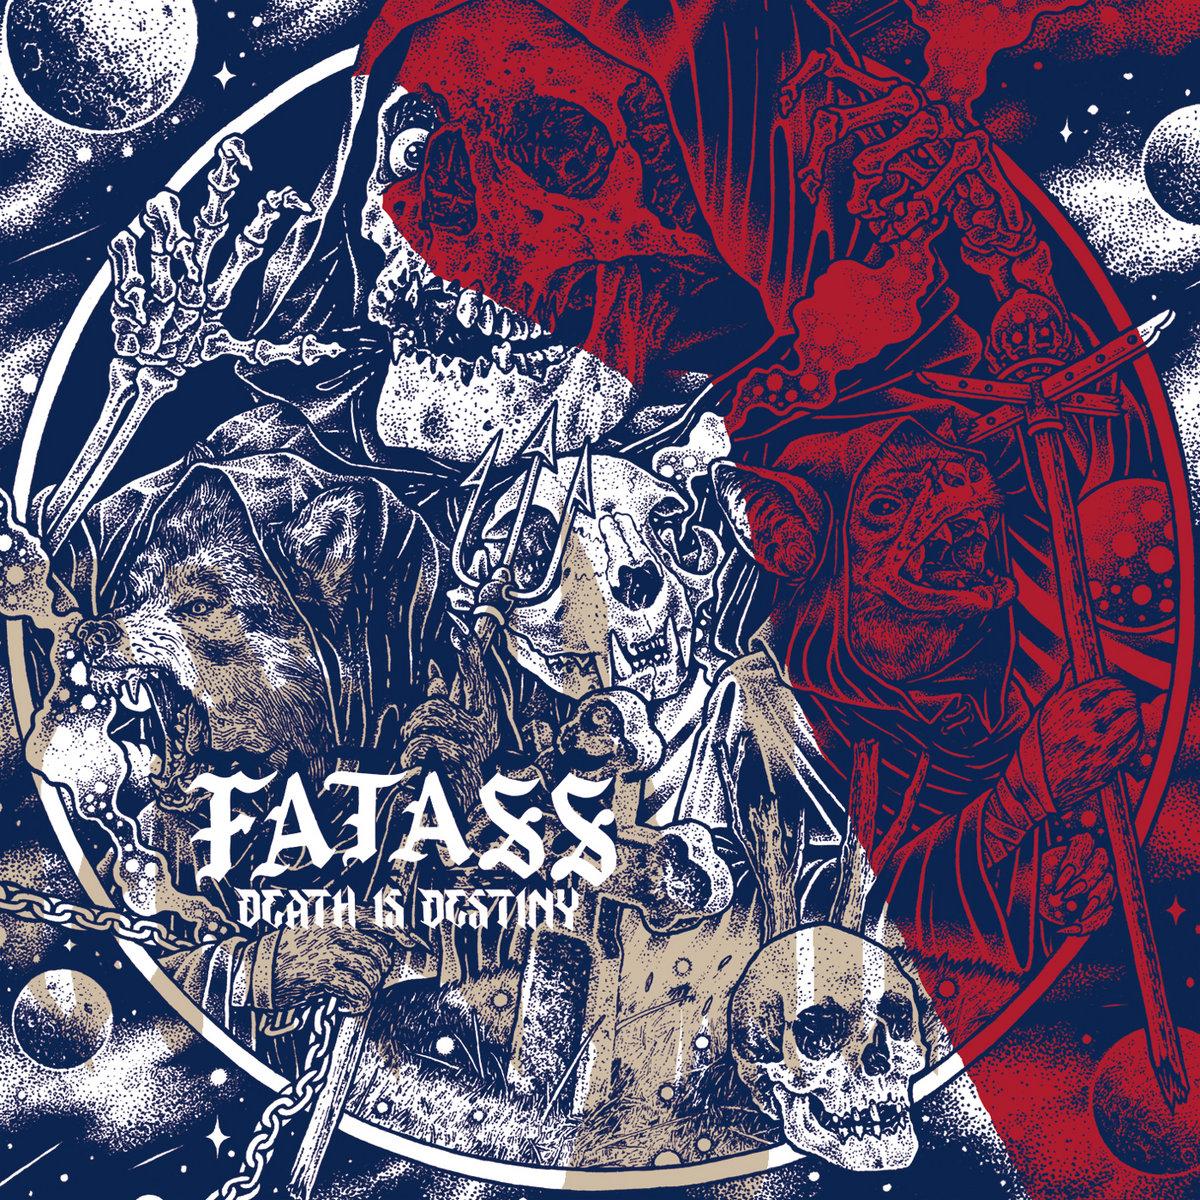 Fatass - Death Is Destiny (2018)